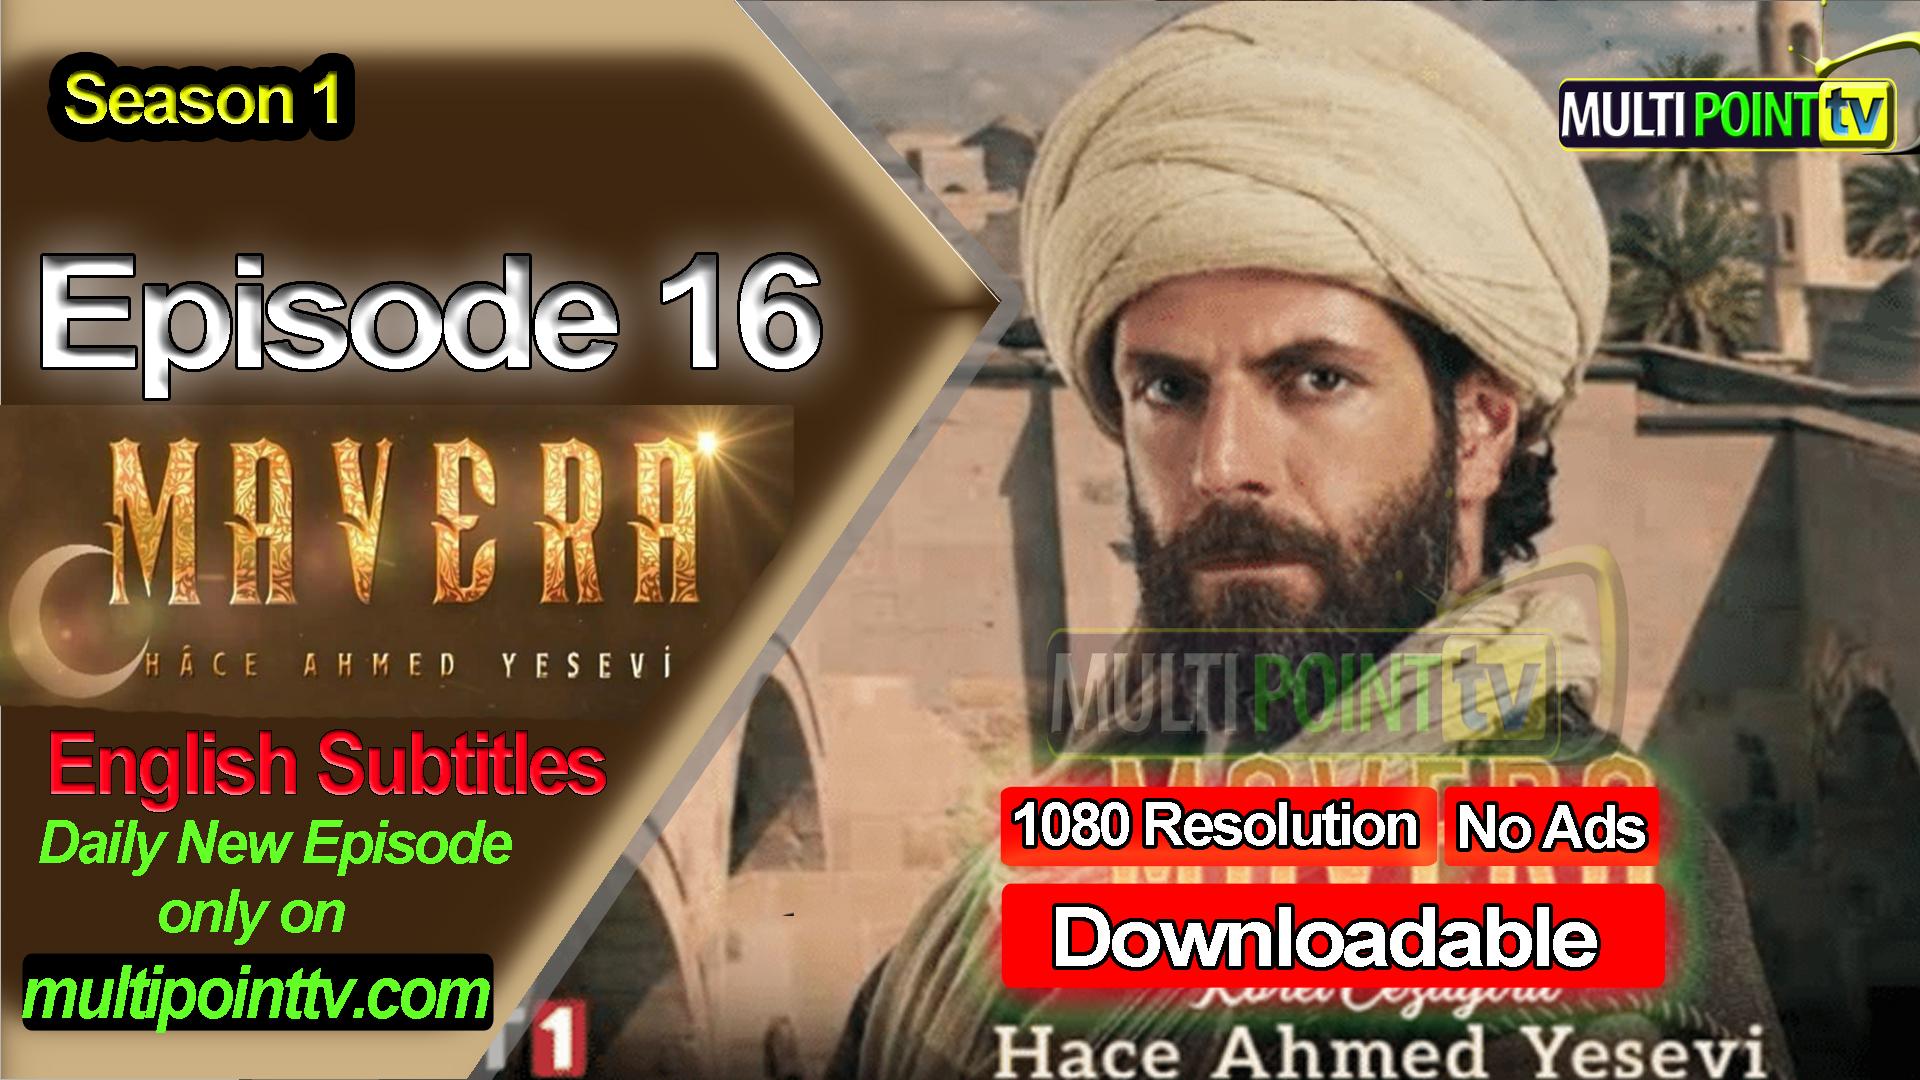 Mavera Episode 16 English Subtitles